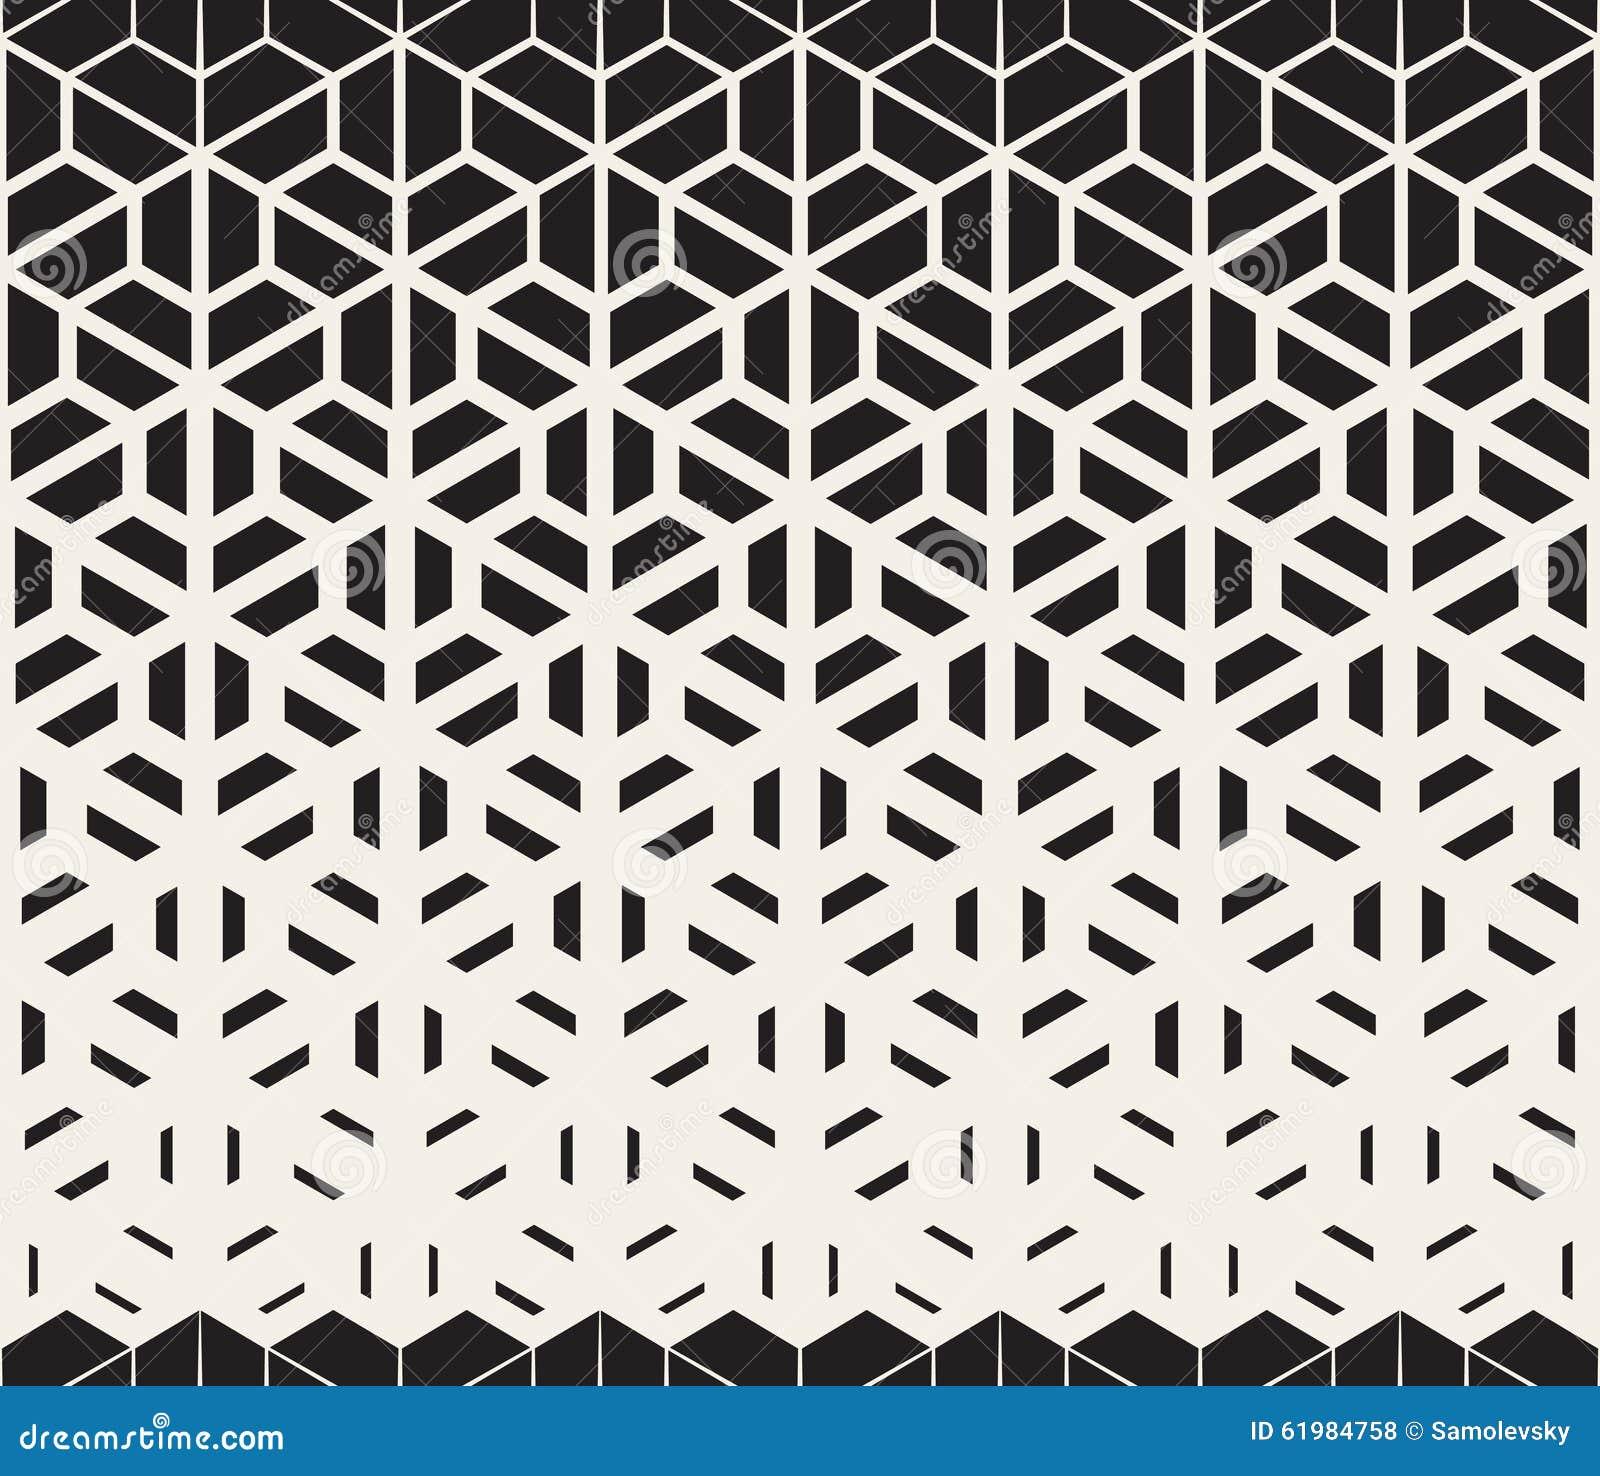 vektor nahtloses schwarzweiss hexagon dreieck aufgeteilte linien halbtonsteigungs muster vektor. Black Bedroom Furniture Sets. Home Design Ideas